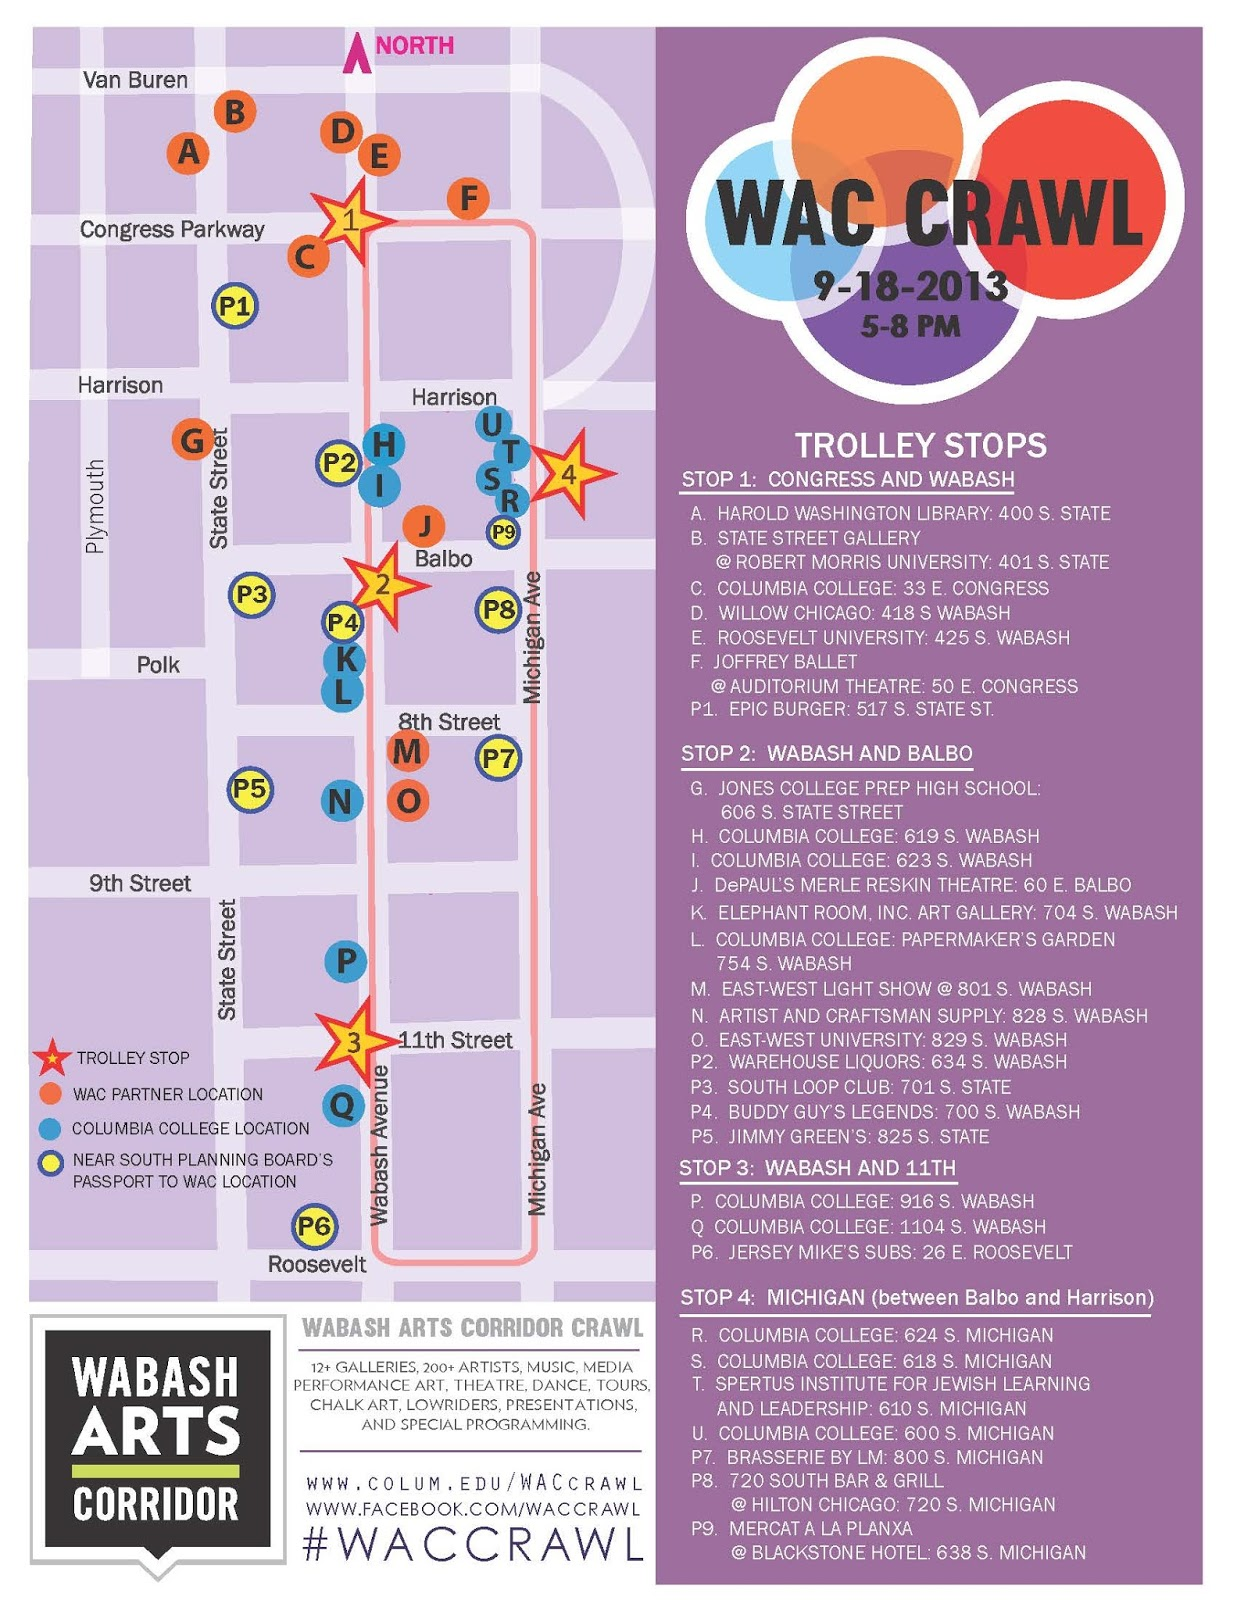 South Loop Connection Wabash Arts Corridor Crawl - Chicago map south loop